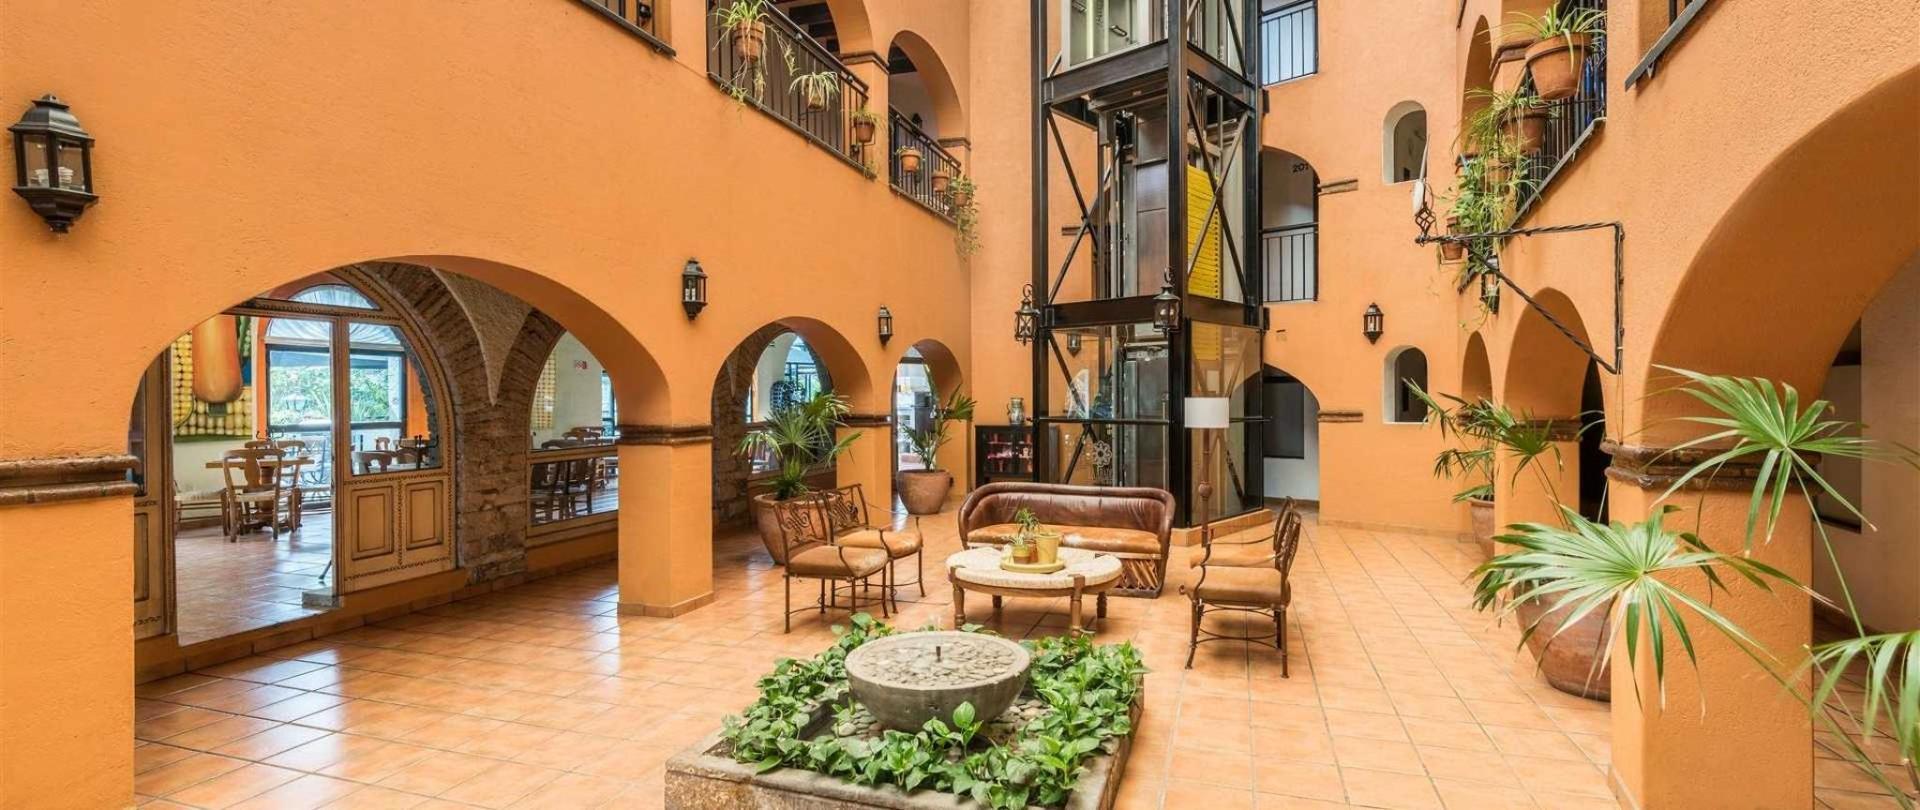 homepage-la-abadia-hotel-guanajuato-mexico6.jpeg